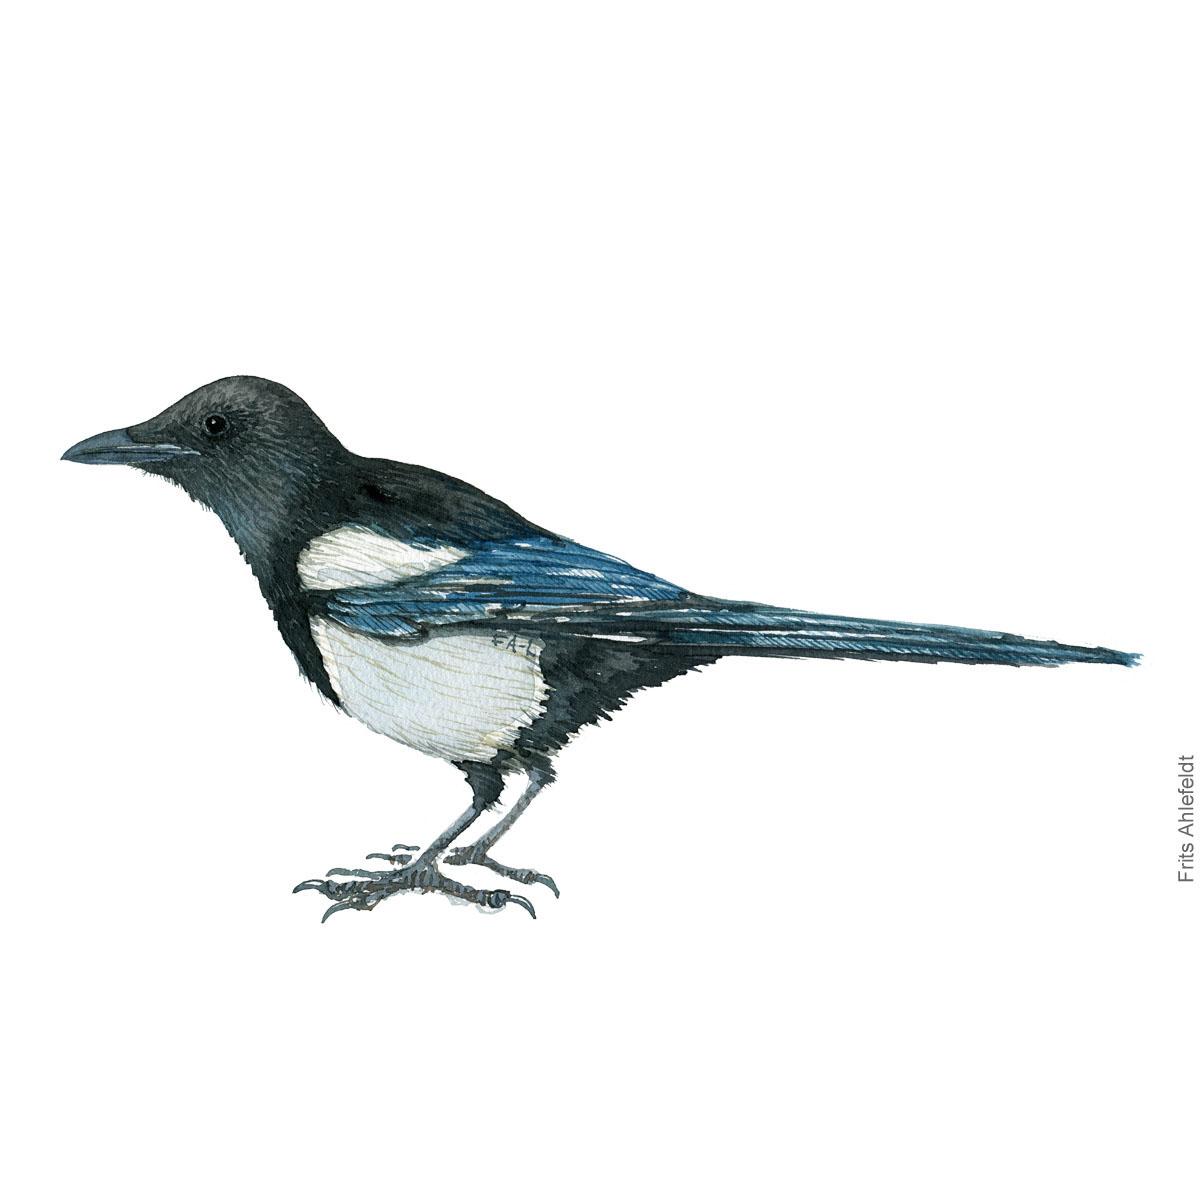 Skade - Eurasian magpie bird watercolor illustration. Artwork by Frits Ahlefeldt. Fugle akvarel